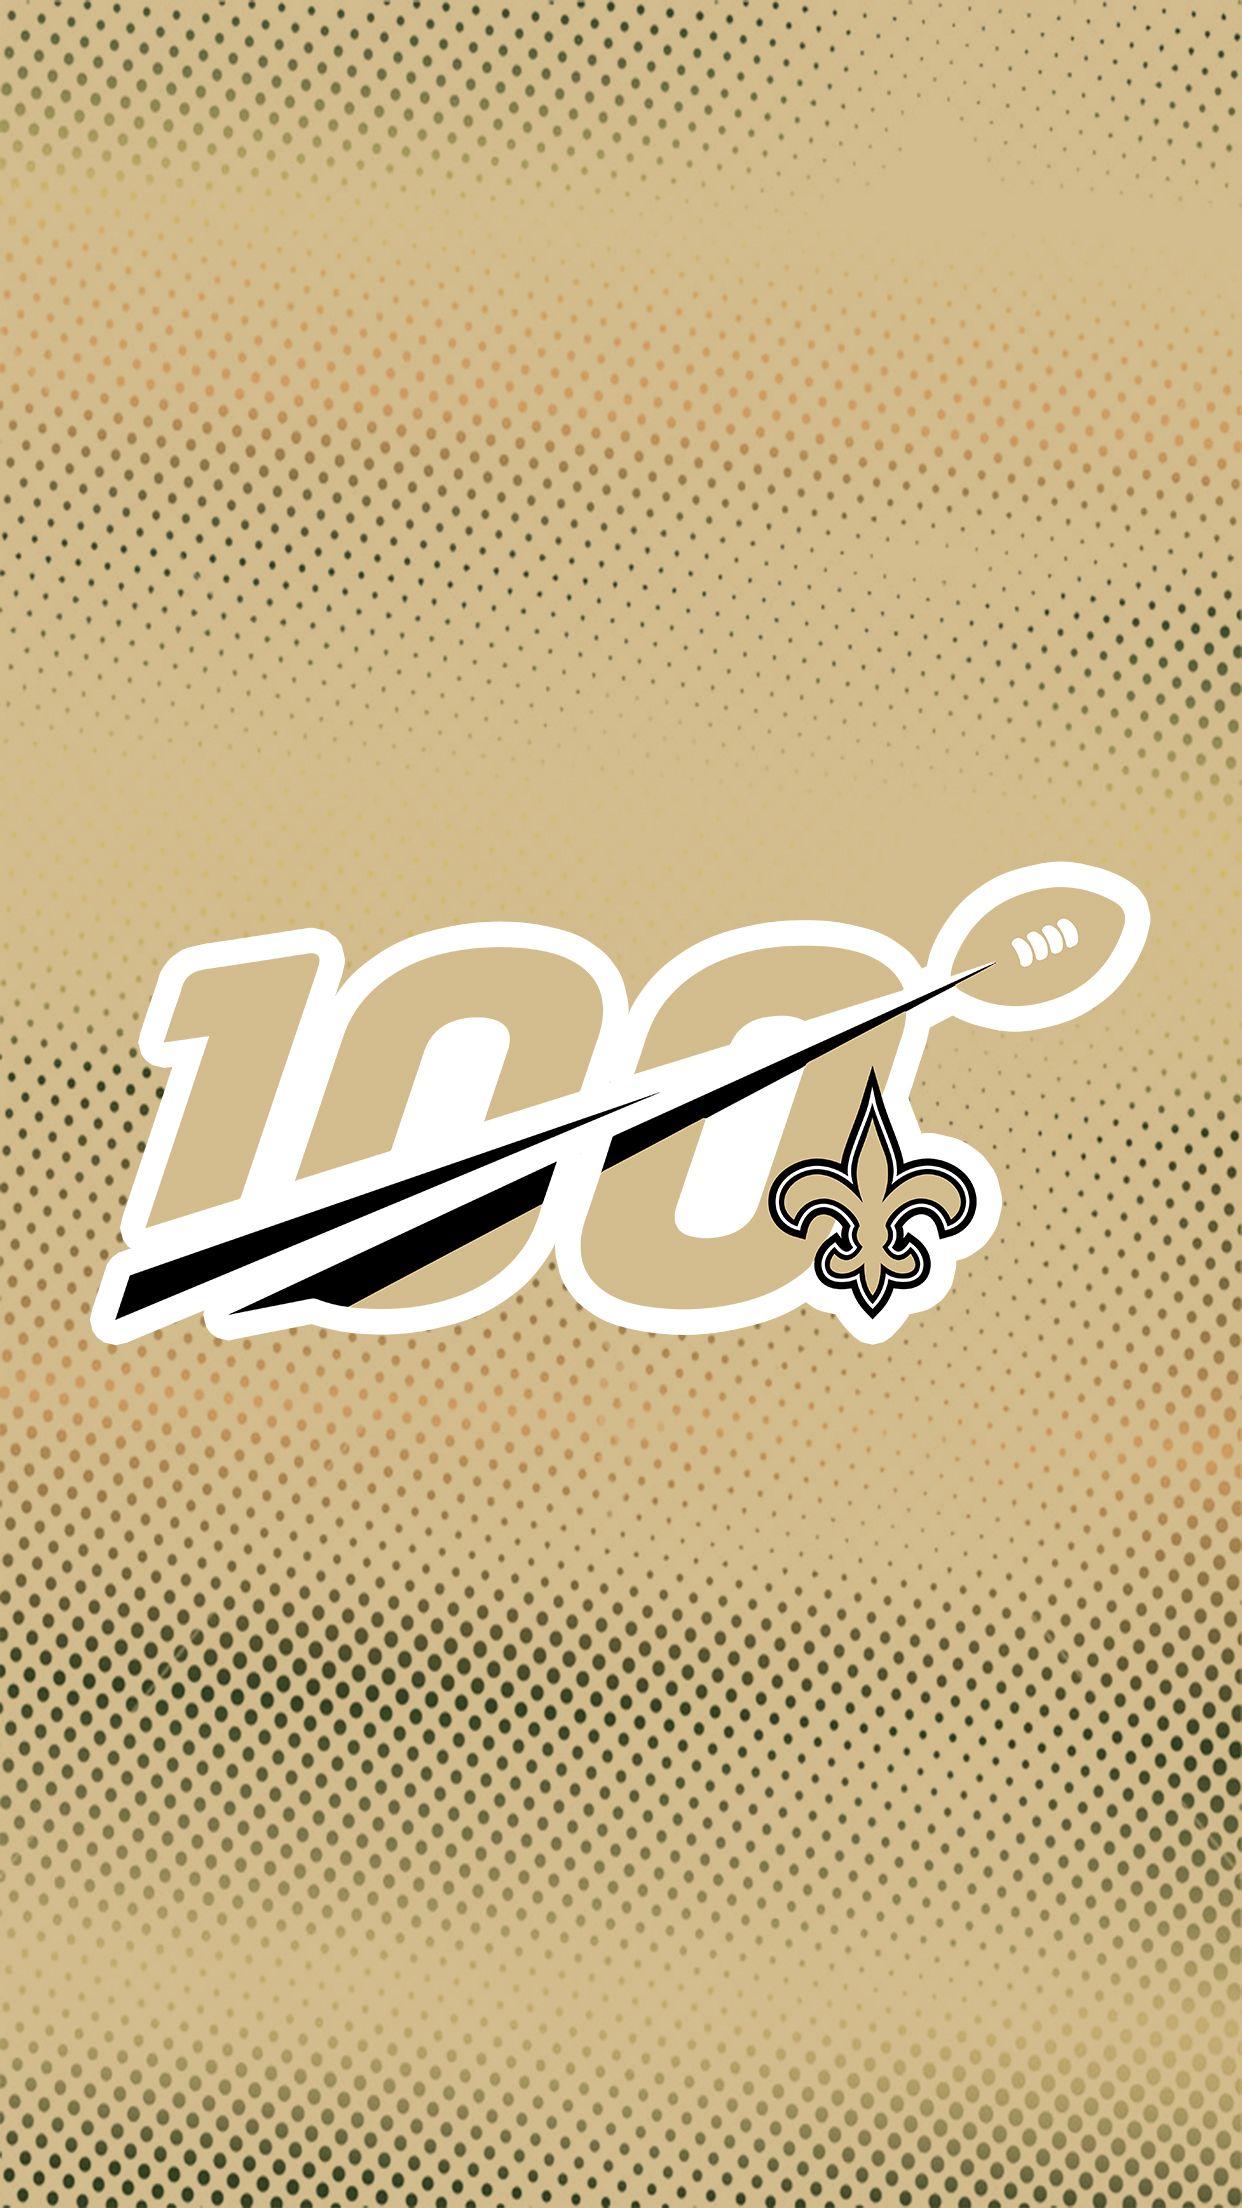 New Orleans Saints Nfl 100 Fanart Wallpaper Nfl Saints Saints Football New Orleans Saints Football